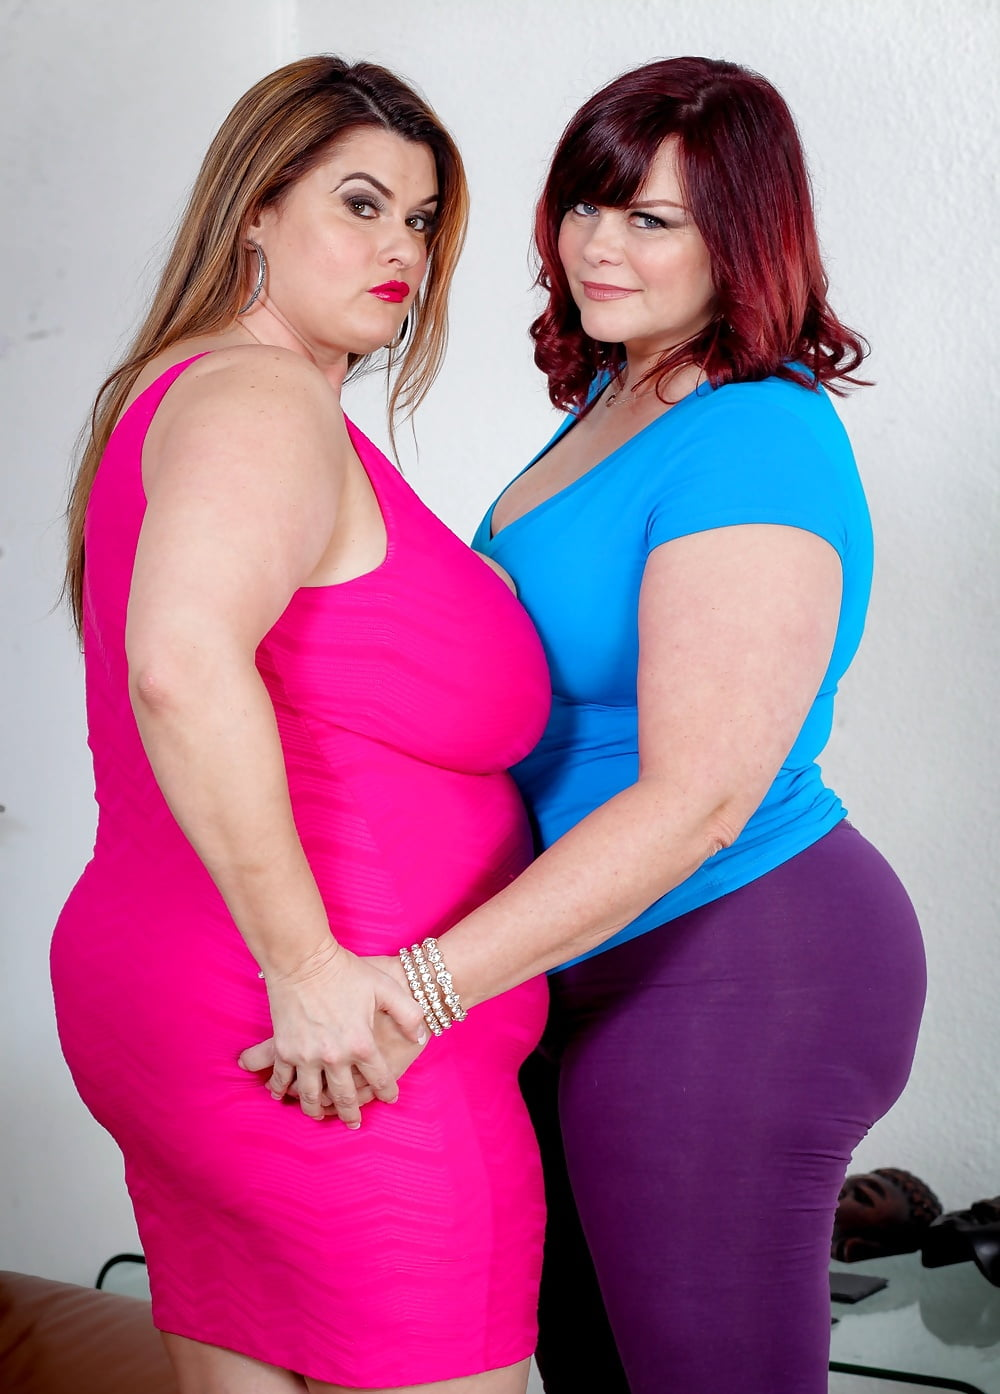 Bbw granny lesbian porn